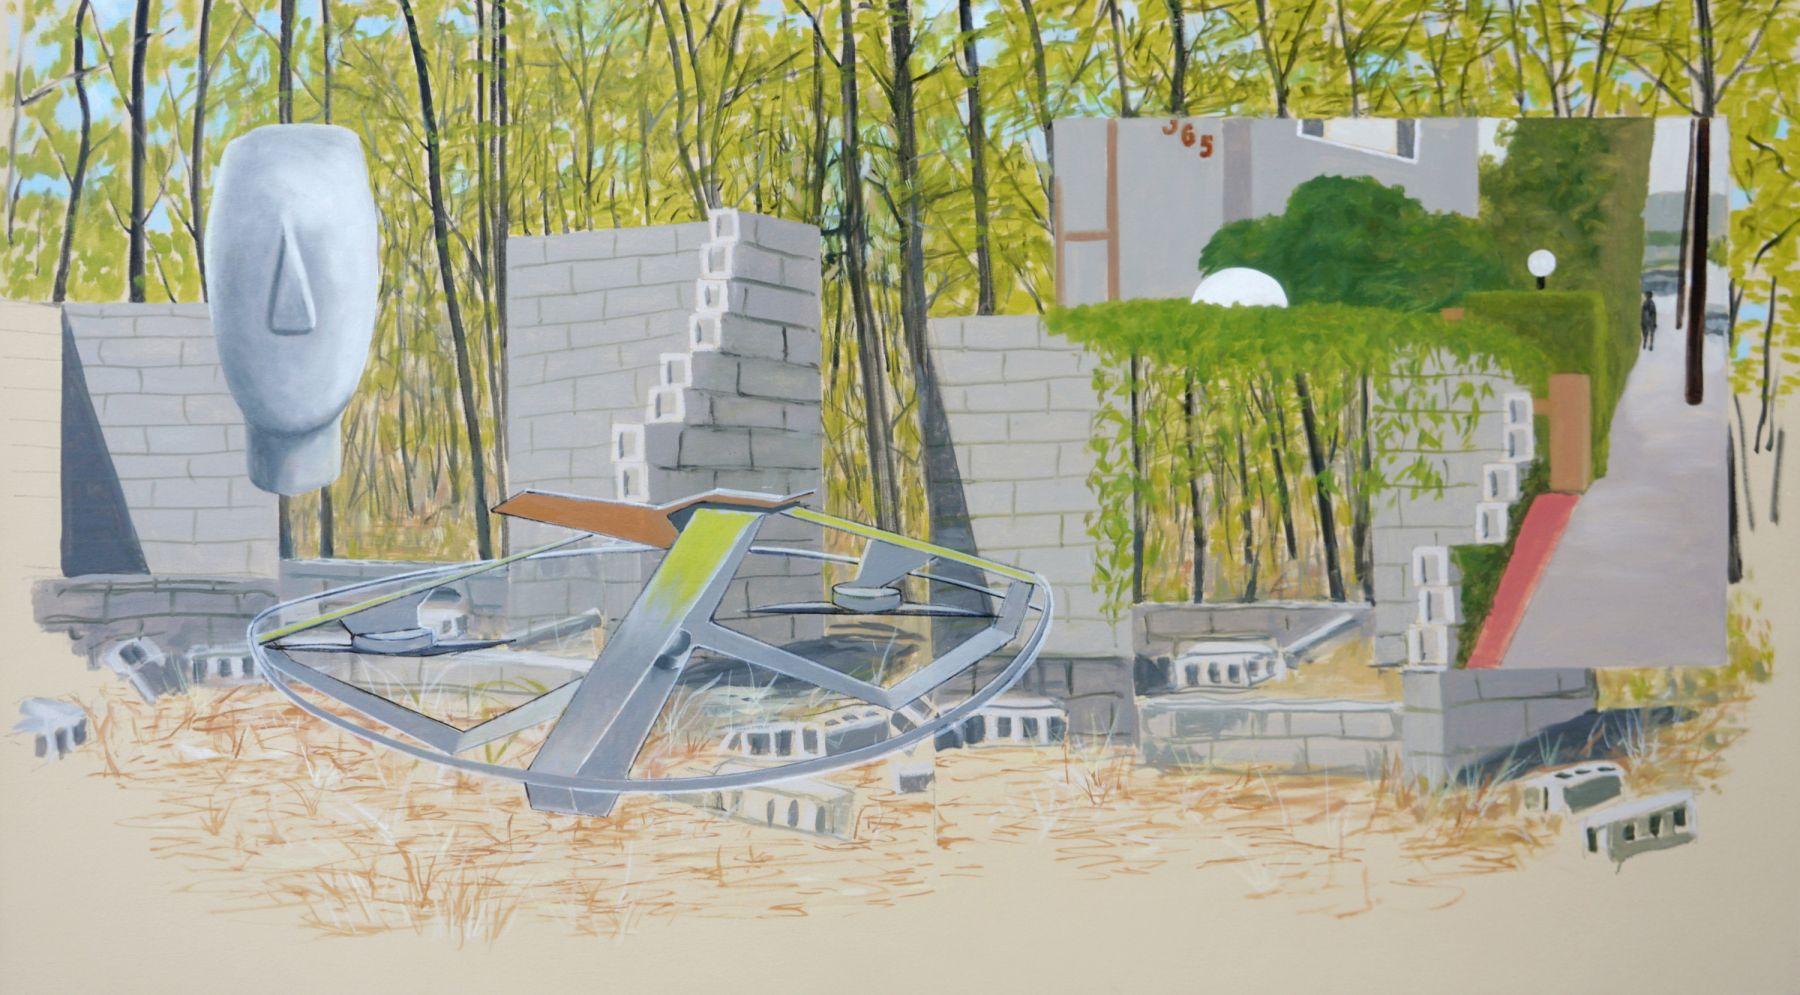 William Leavitt, Pumphouse Ruins, 2020